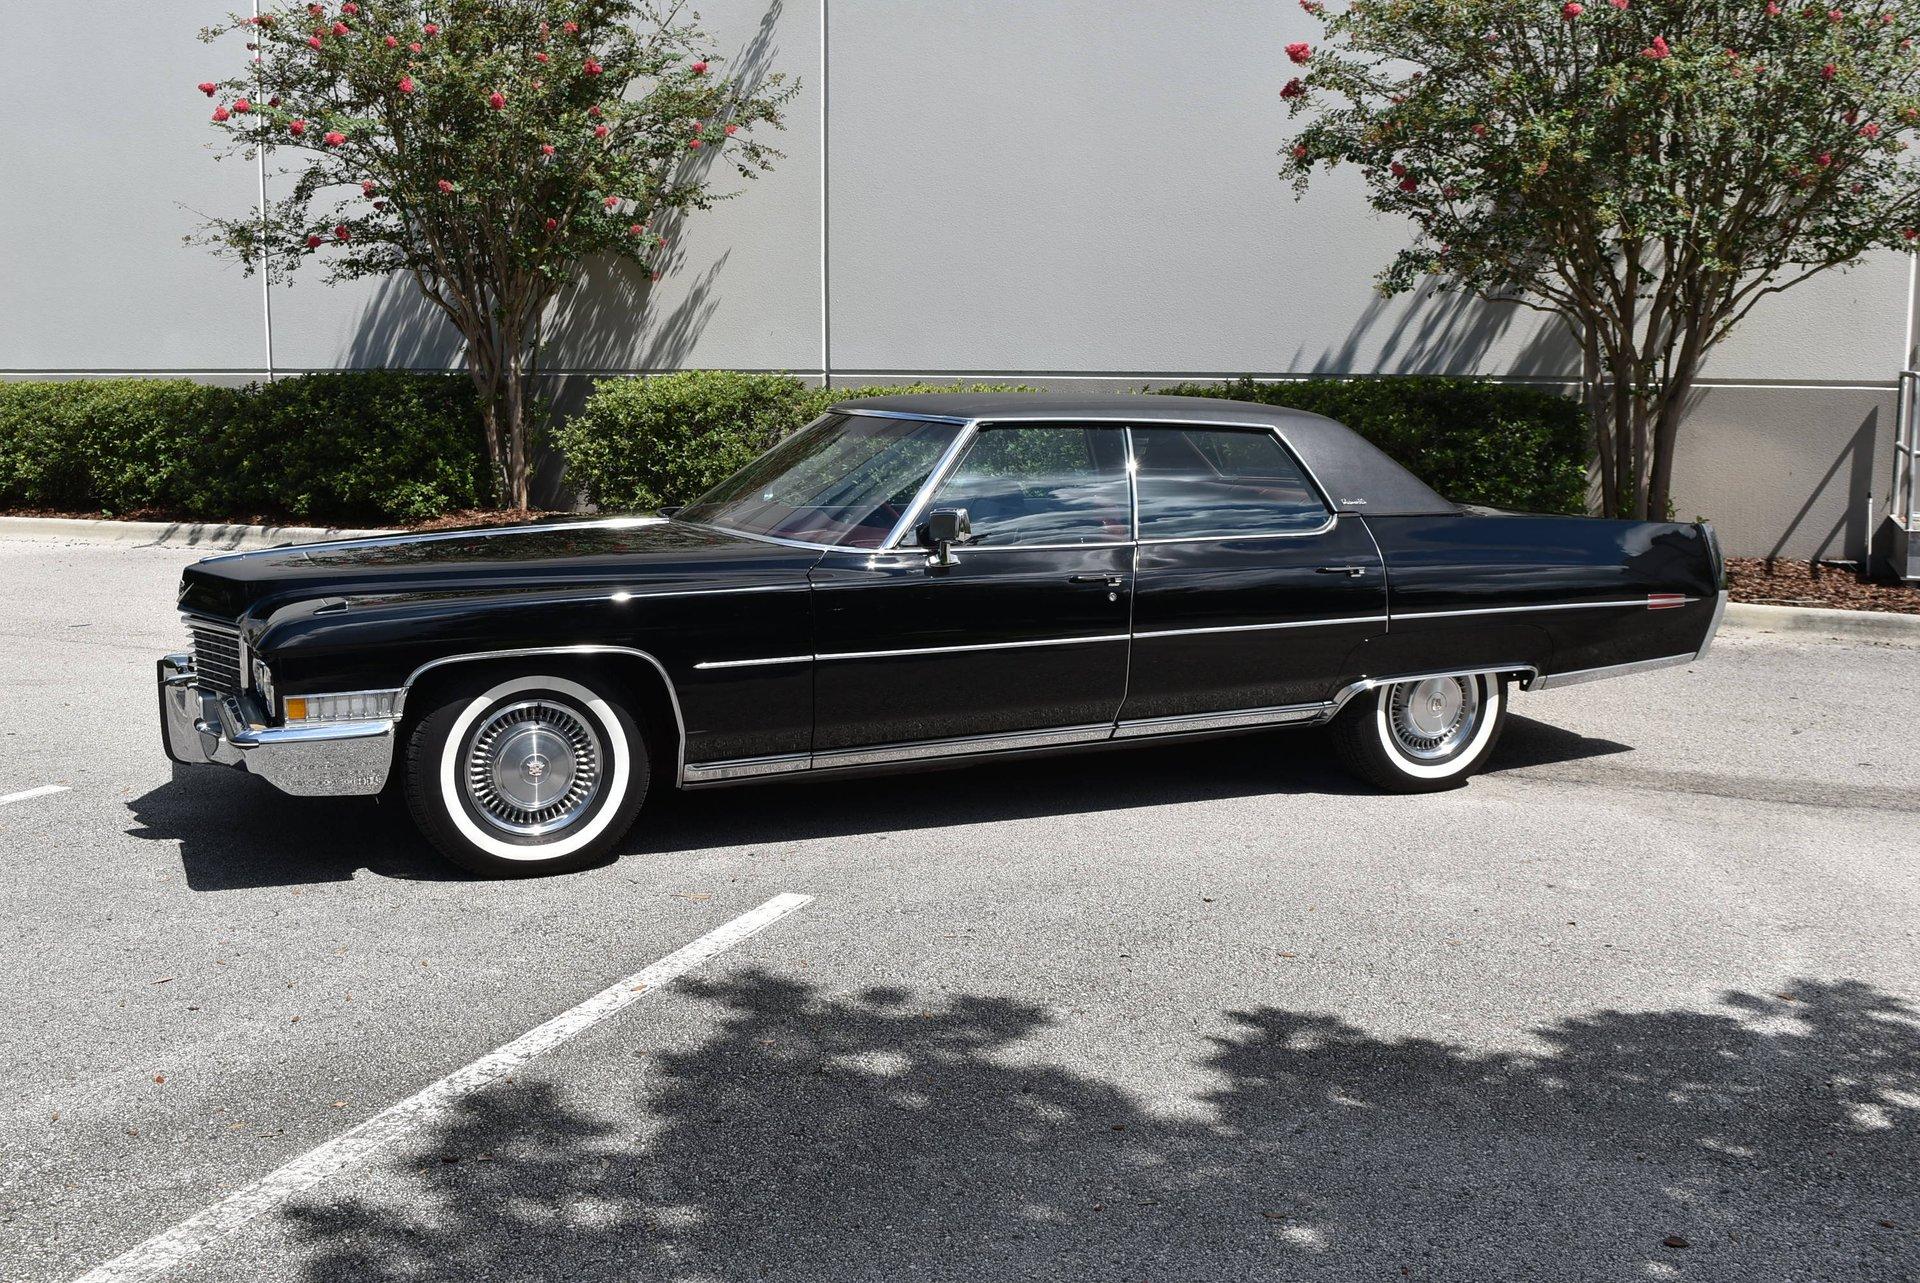 ... For Sale 1972 Cadillac Sedan DeVille ...